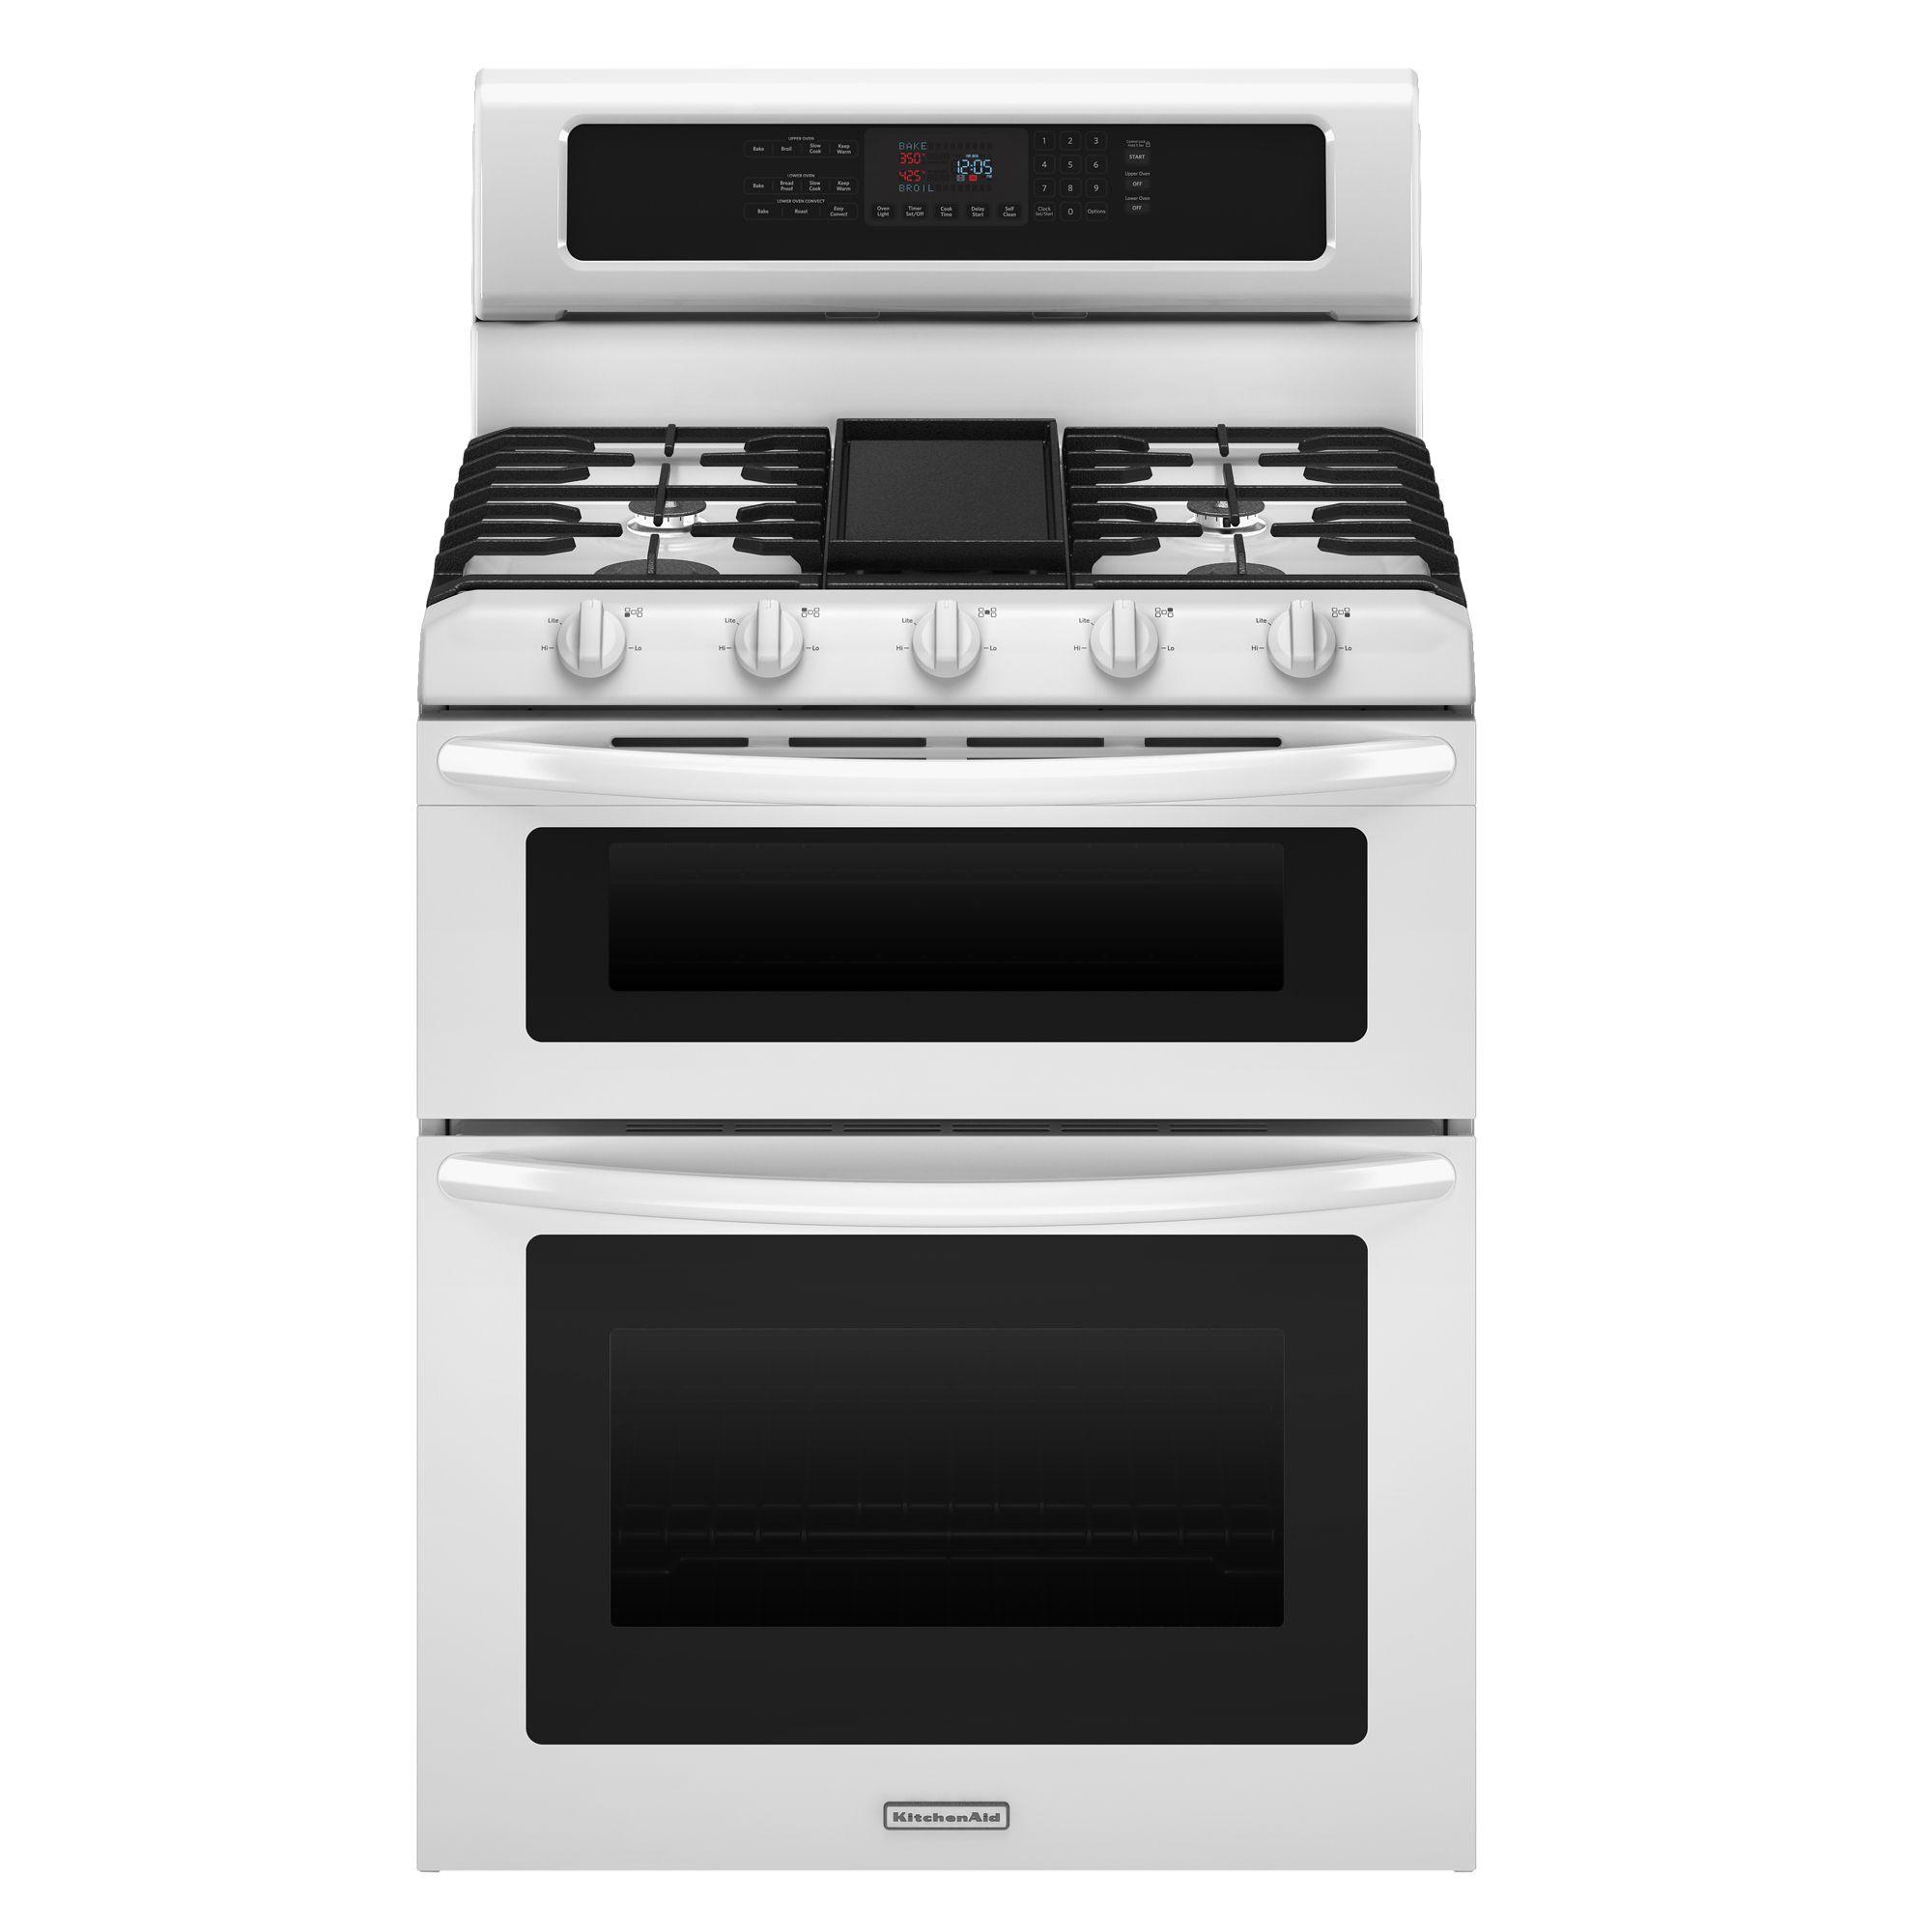 KitchenAid - KGRS505XWH - 6 cu. ft. Double Oven Gas Range ...